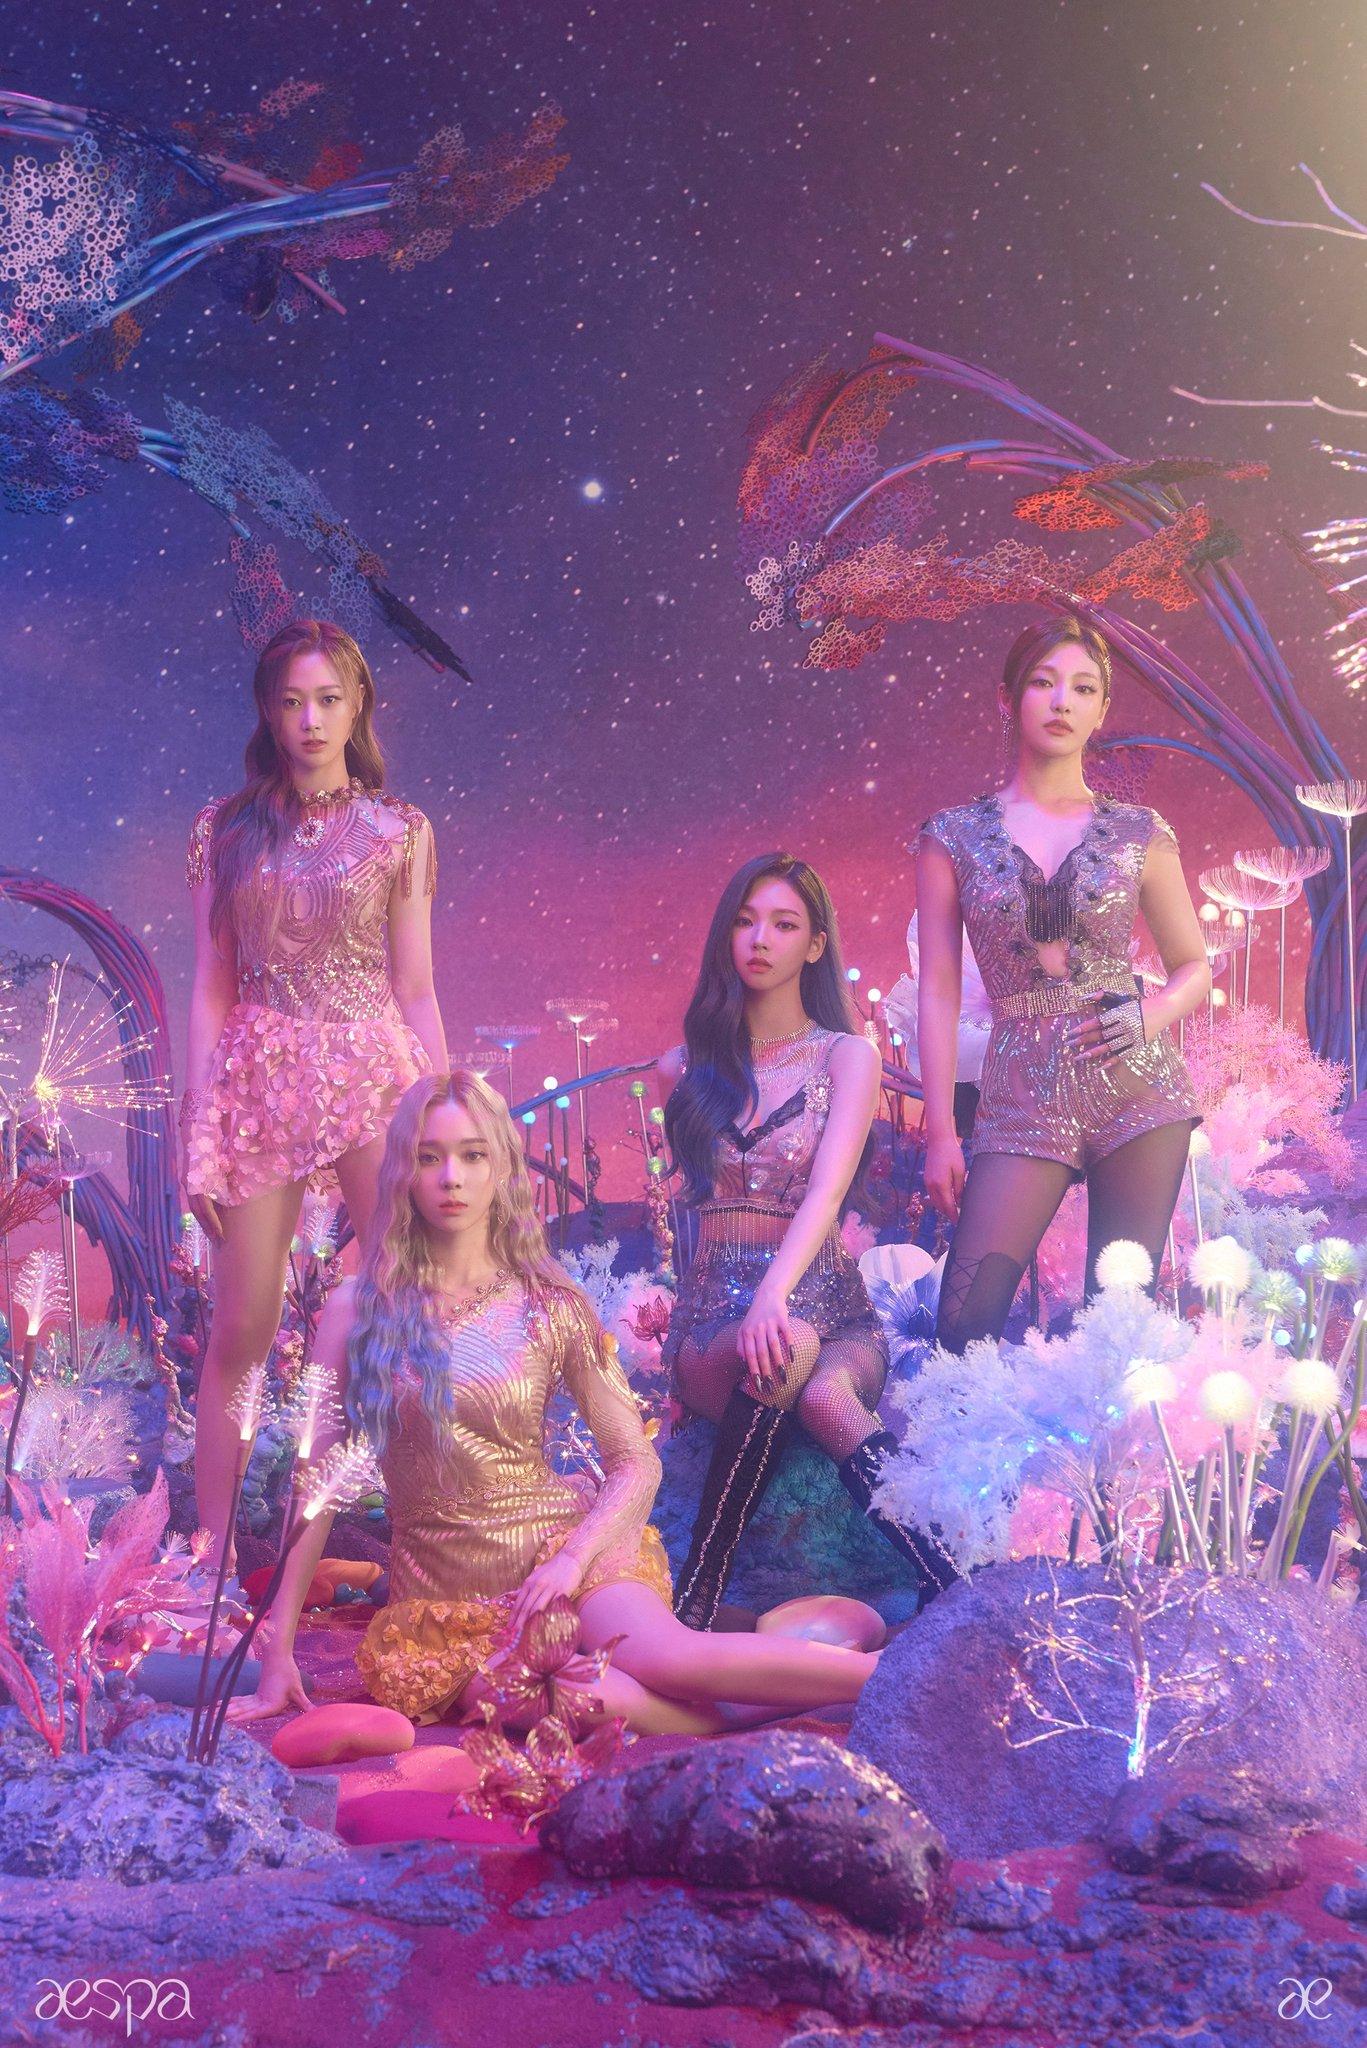 aespa Members Look Dazzling in the Latest Teaser Ahead of Debut